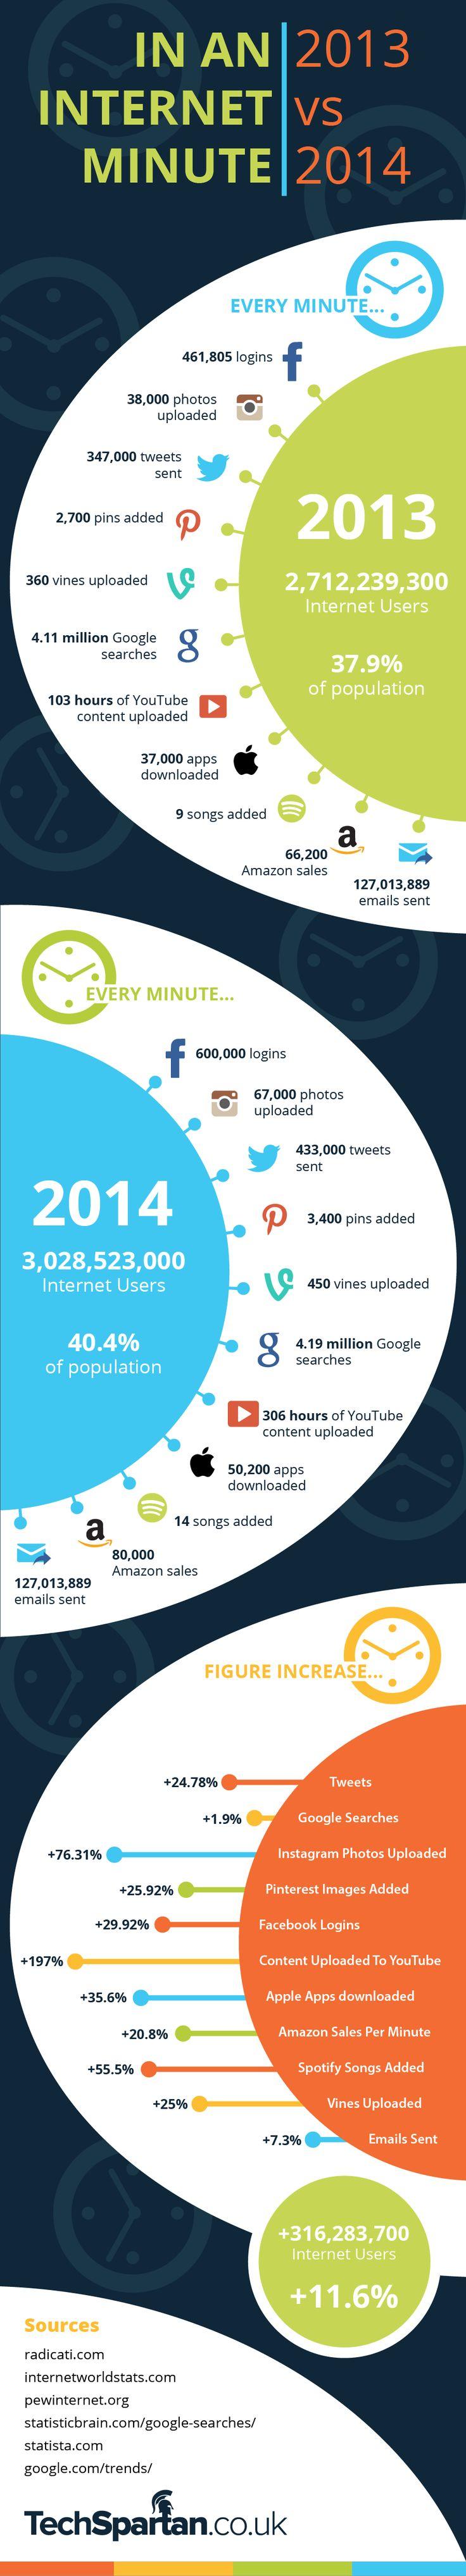 Facebook, Google, Twitter, Instagram, Vine, YouTube, Amazon, Email, Pinterest: #Internet In A Minute – 2013 VS 2014